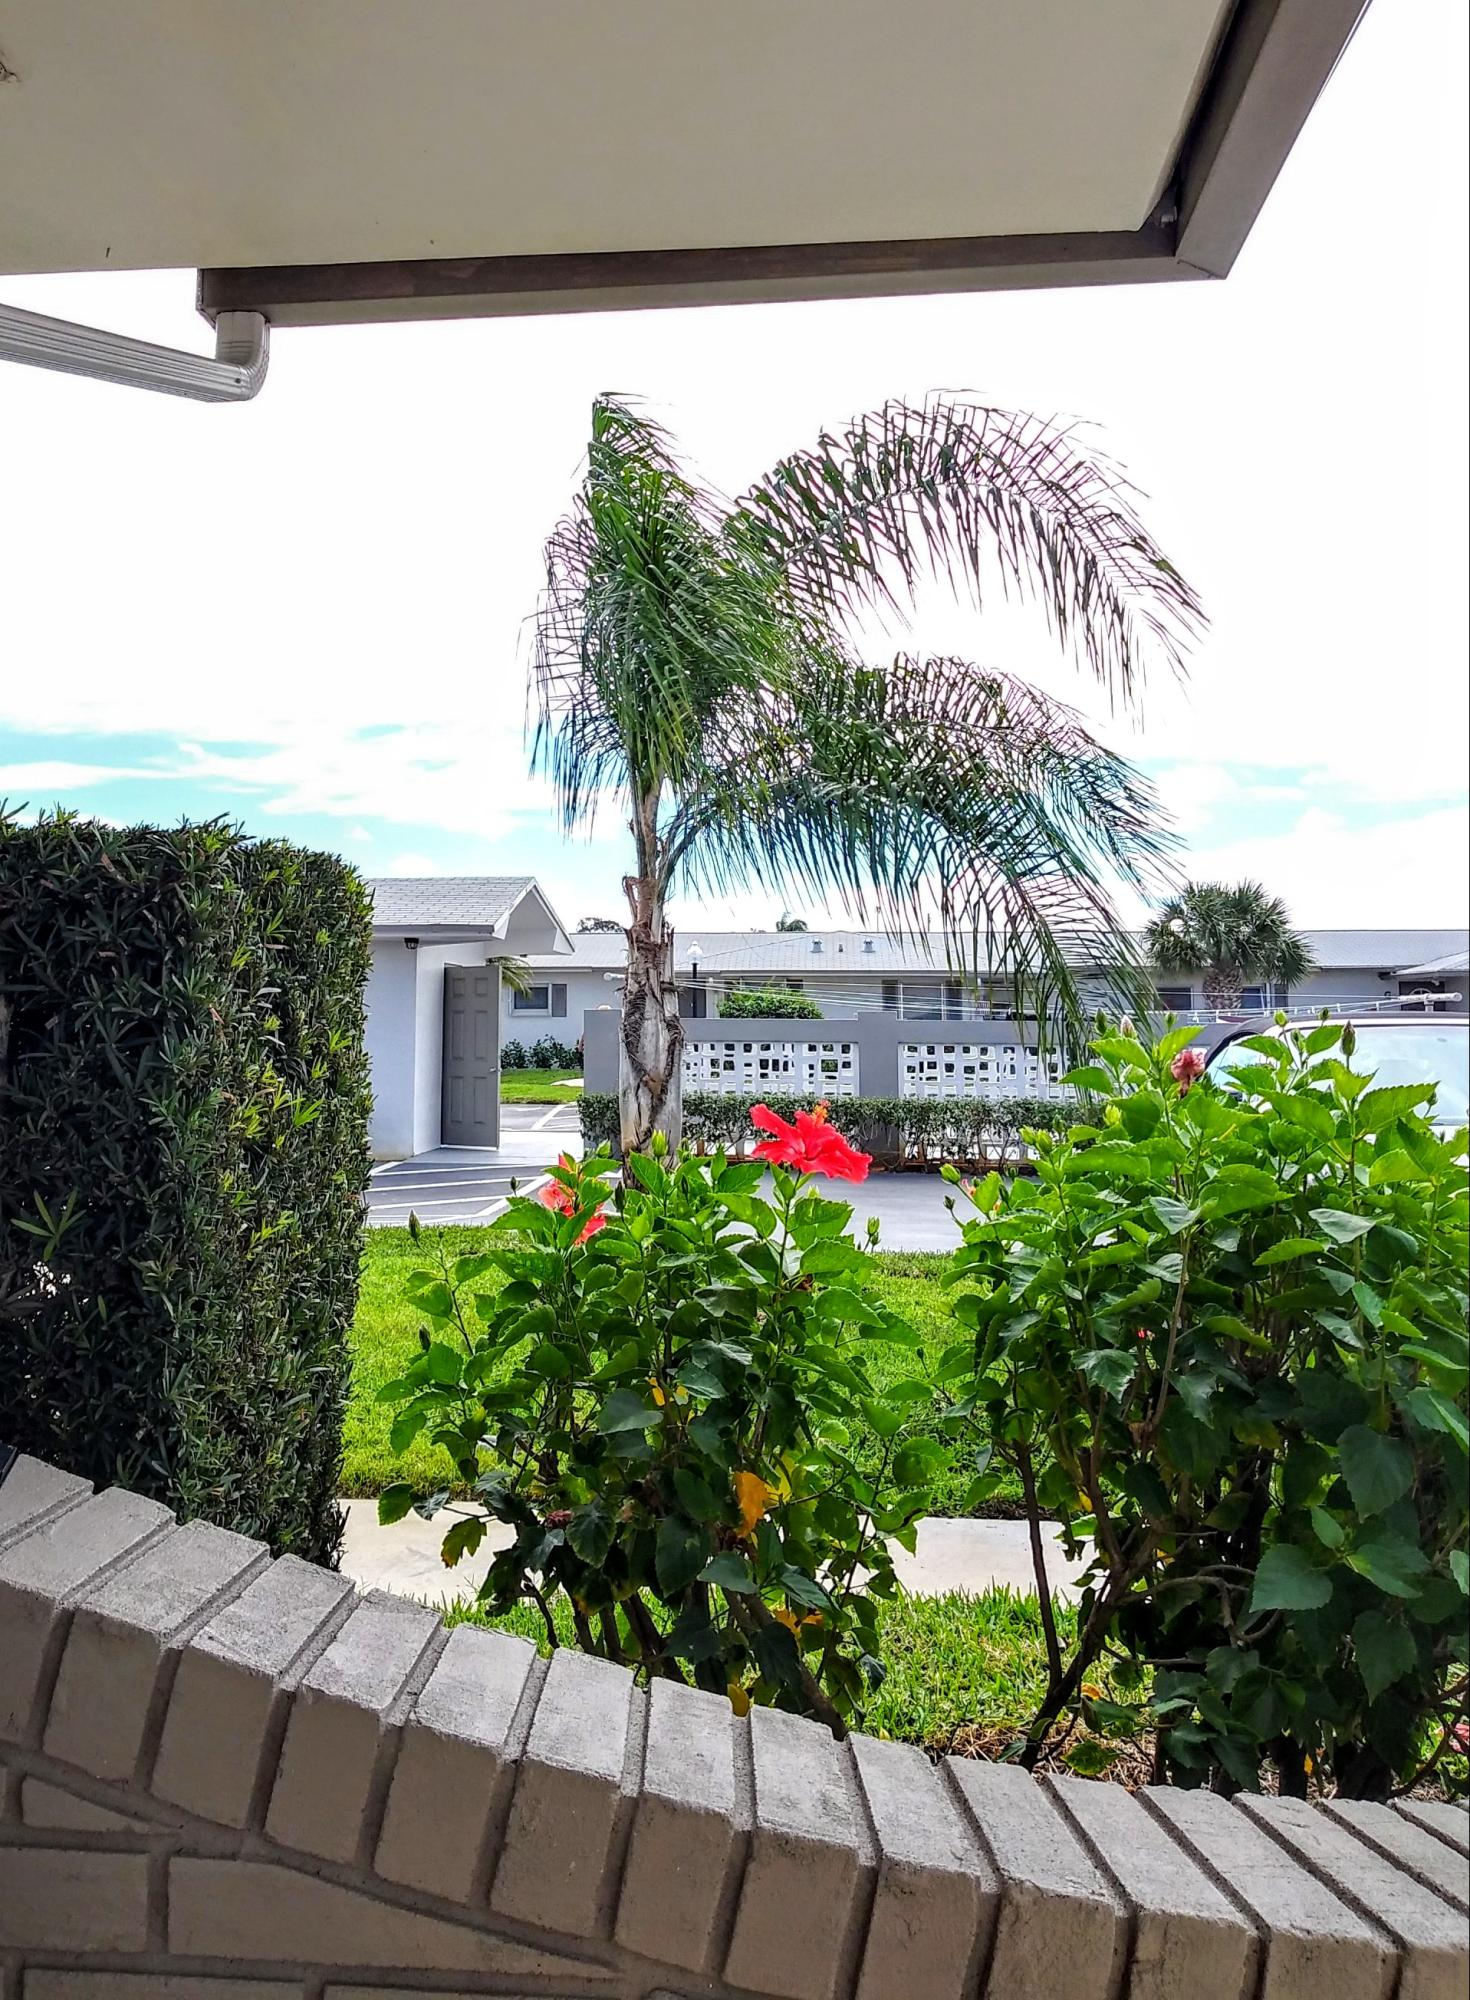 2825 Crosley Drive- West Palm Beach- Florida 33415, 2 Bedrooms Bedrooms, ,1 BathroomBathrooms,Condo/Coop,For Rent,Crosley,1,RX-10508991